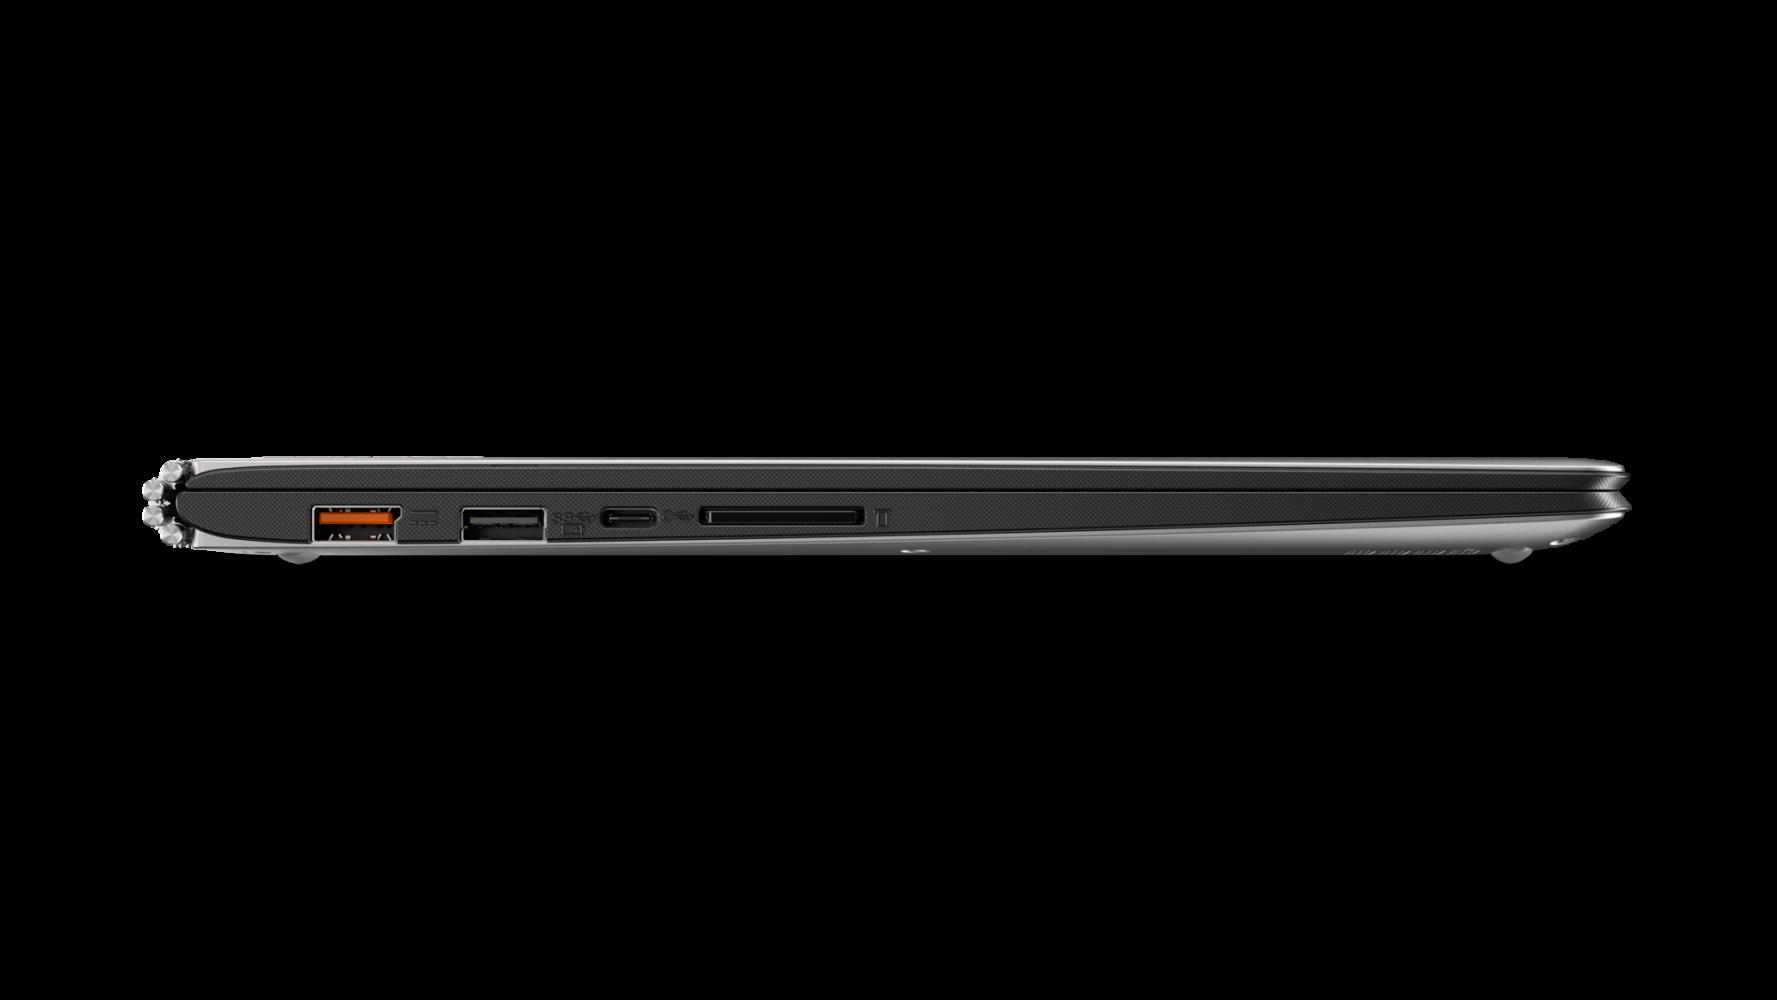 Ноутбук Lenovo Yoga 900-13 (80MK00M8UA) Silver - 8